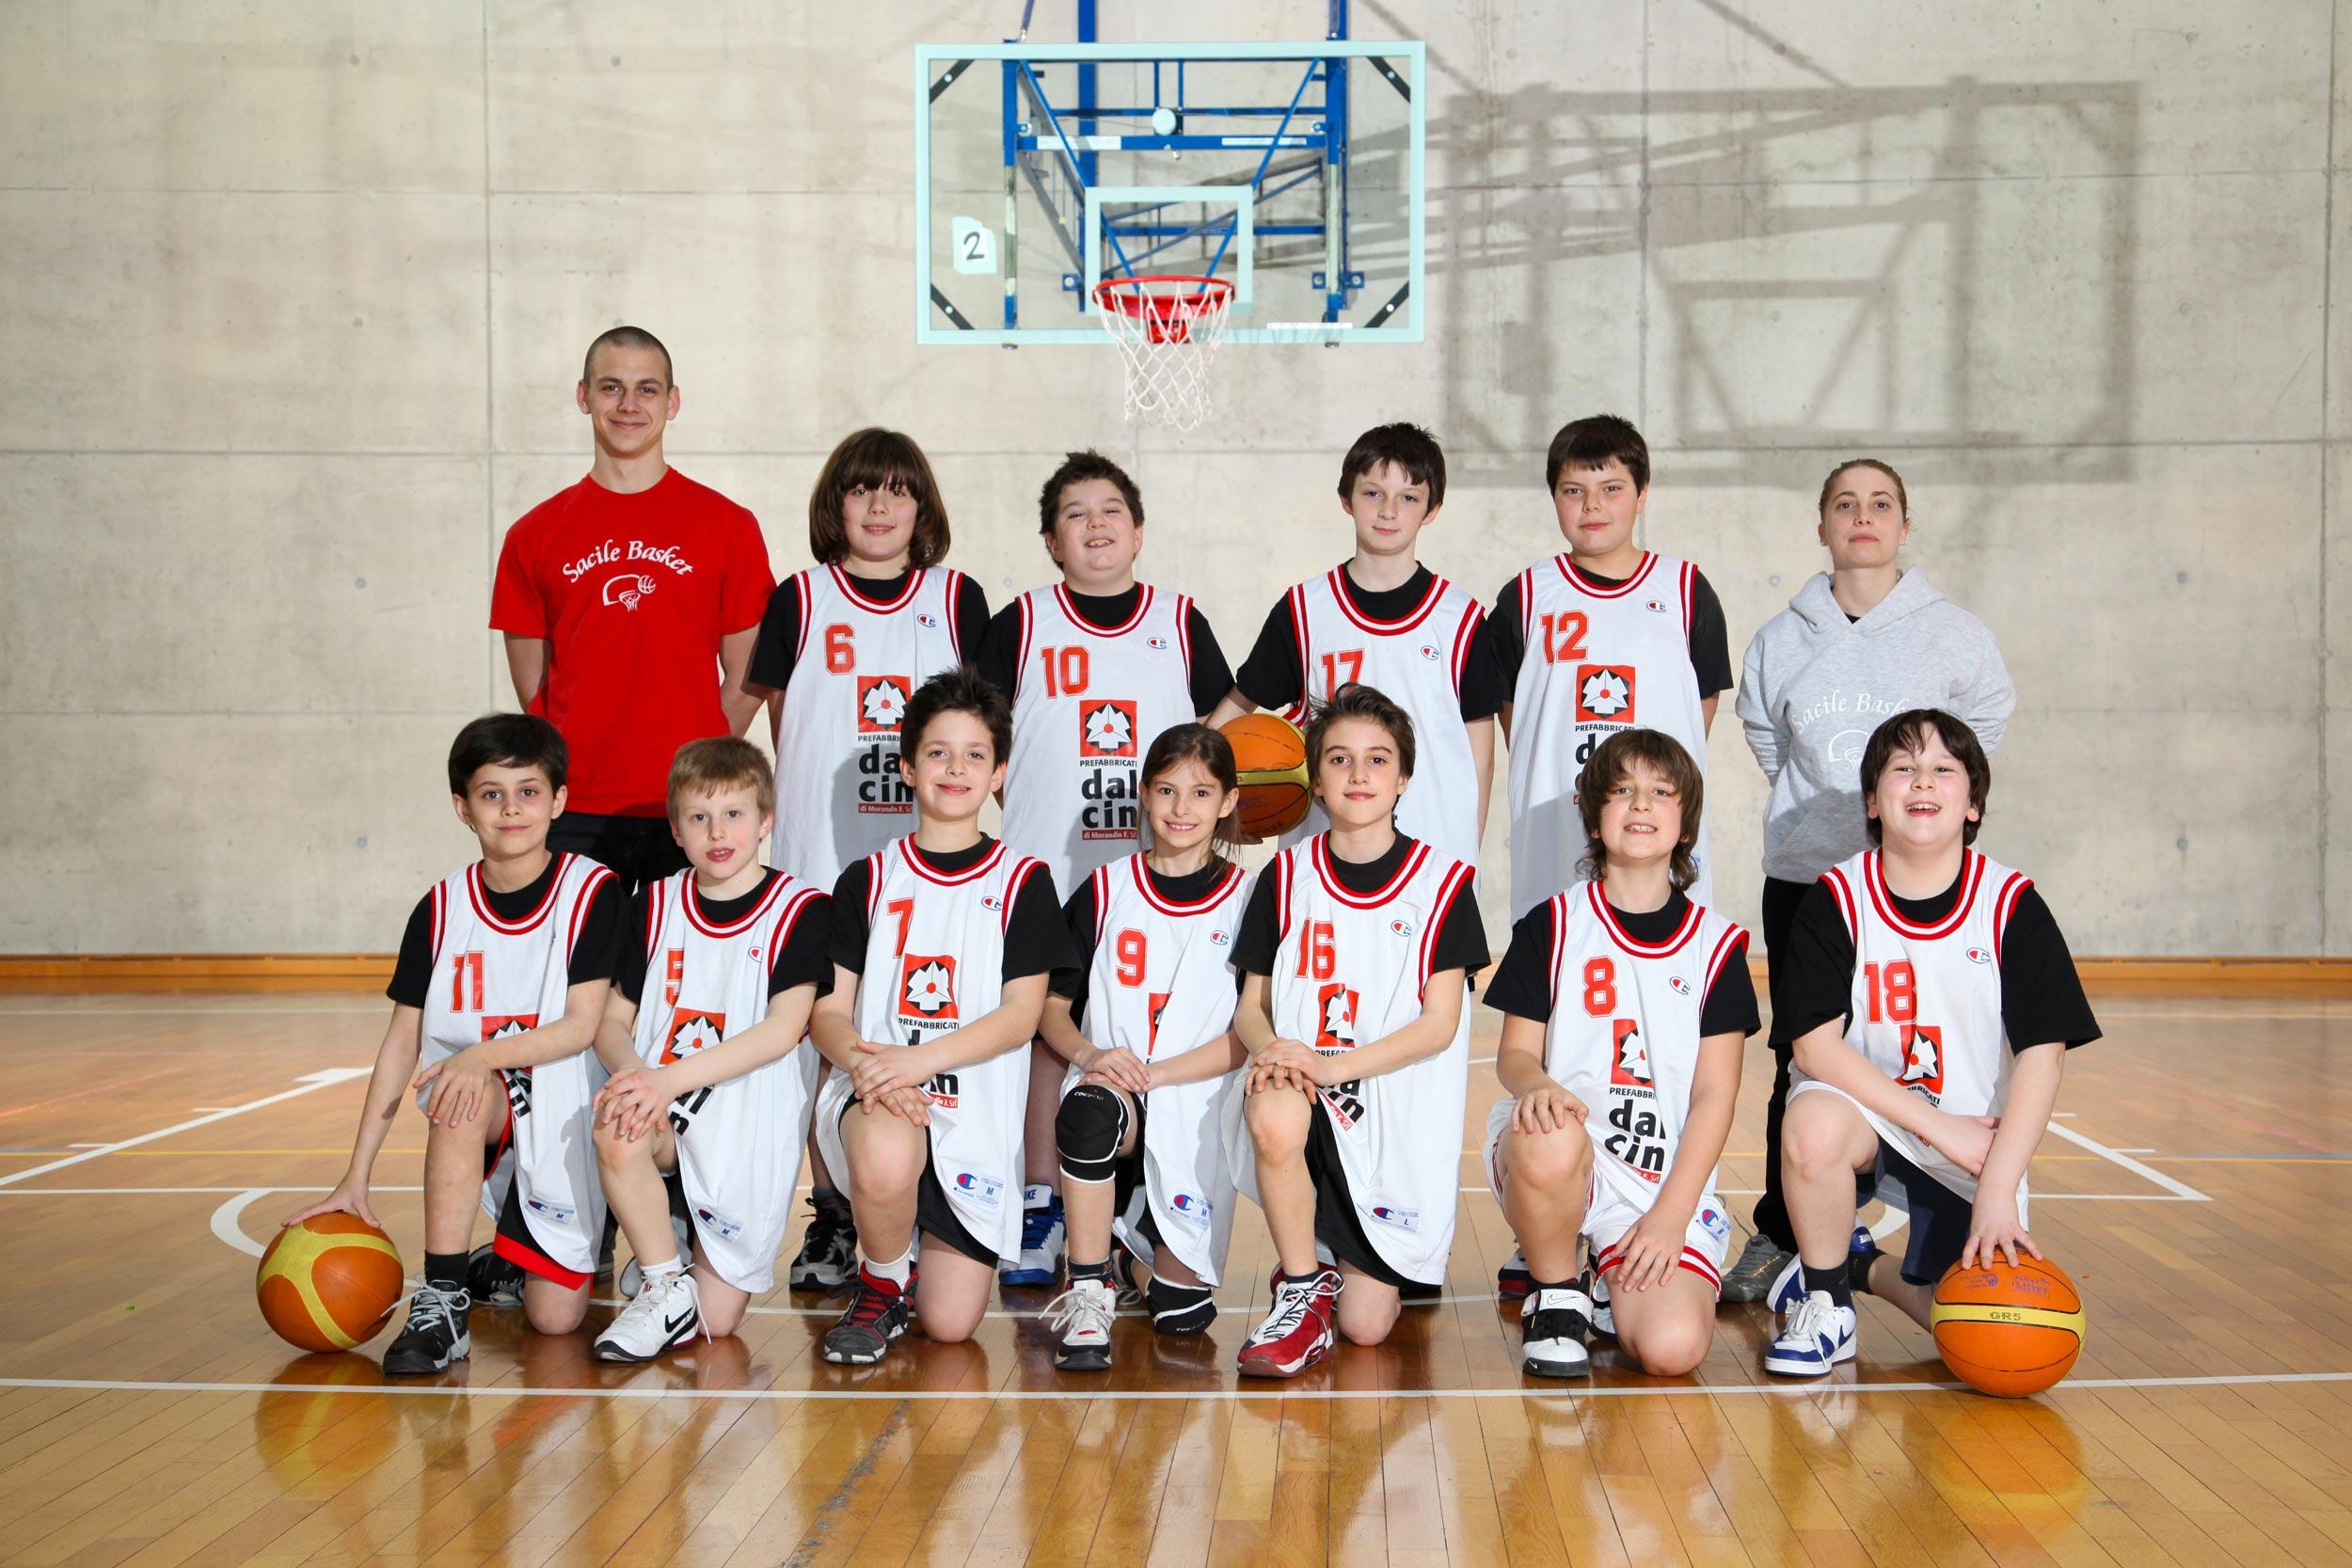 Aquilotti-2010-2011